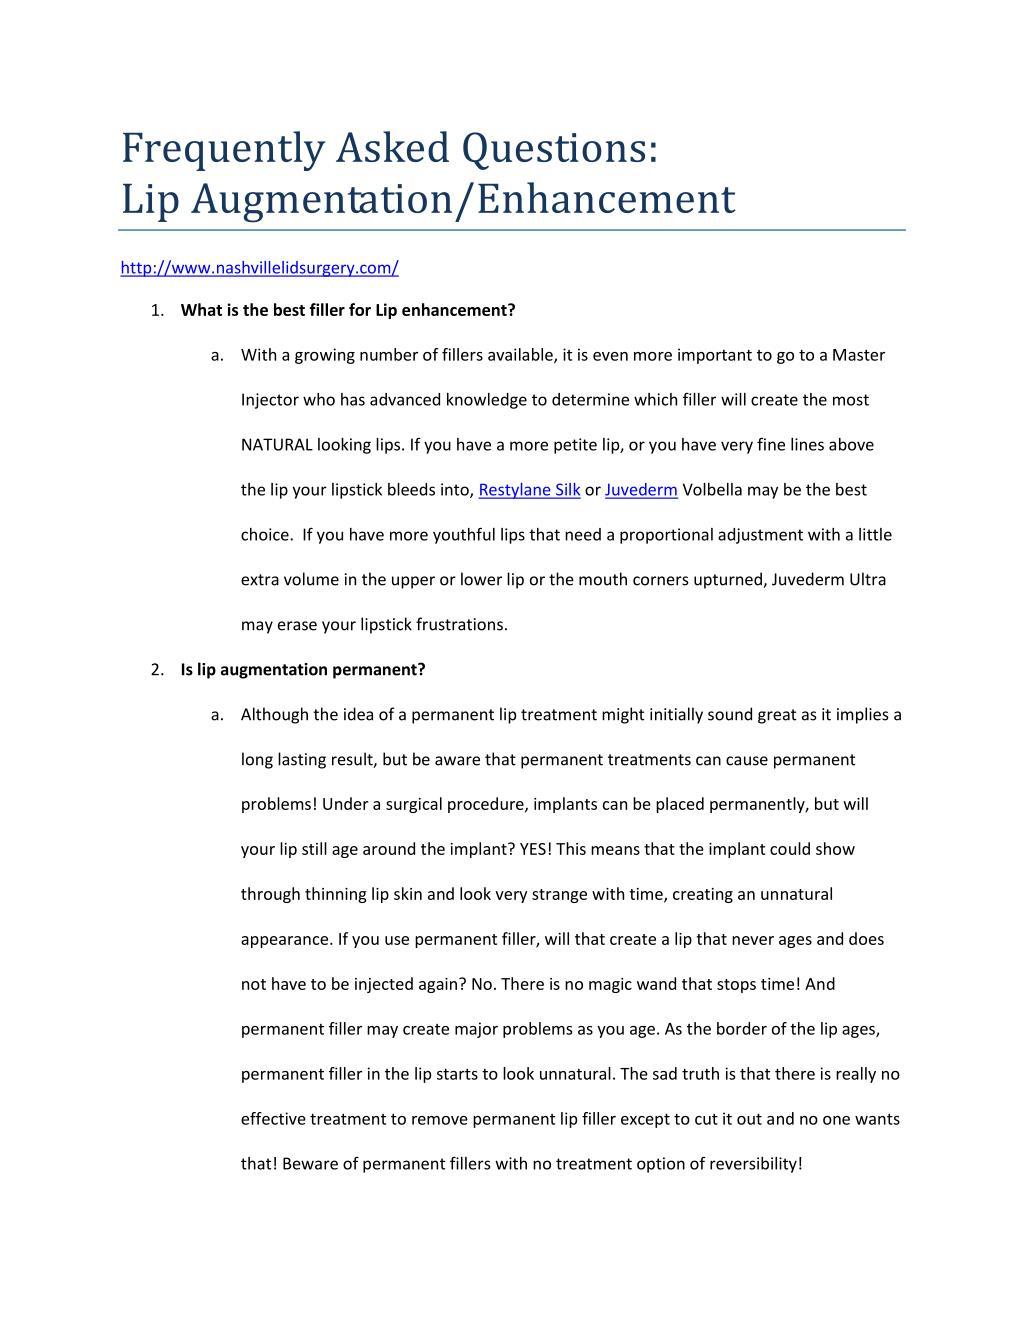 PPT - Lip Augmentation 101 PowerPoint Presentation - ID:7353462